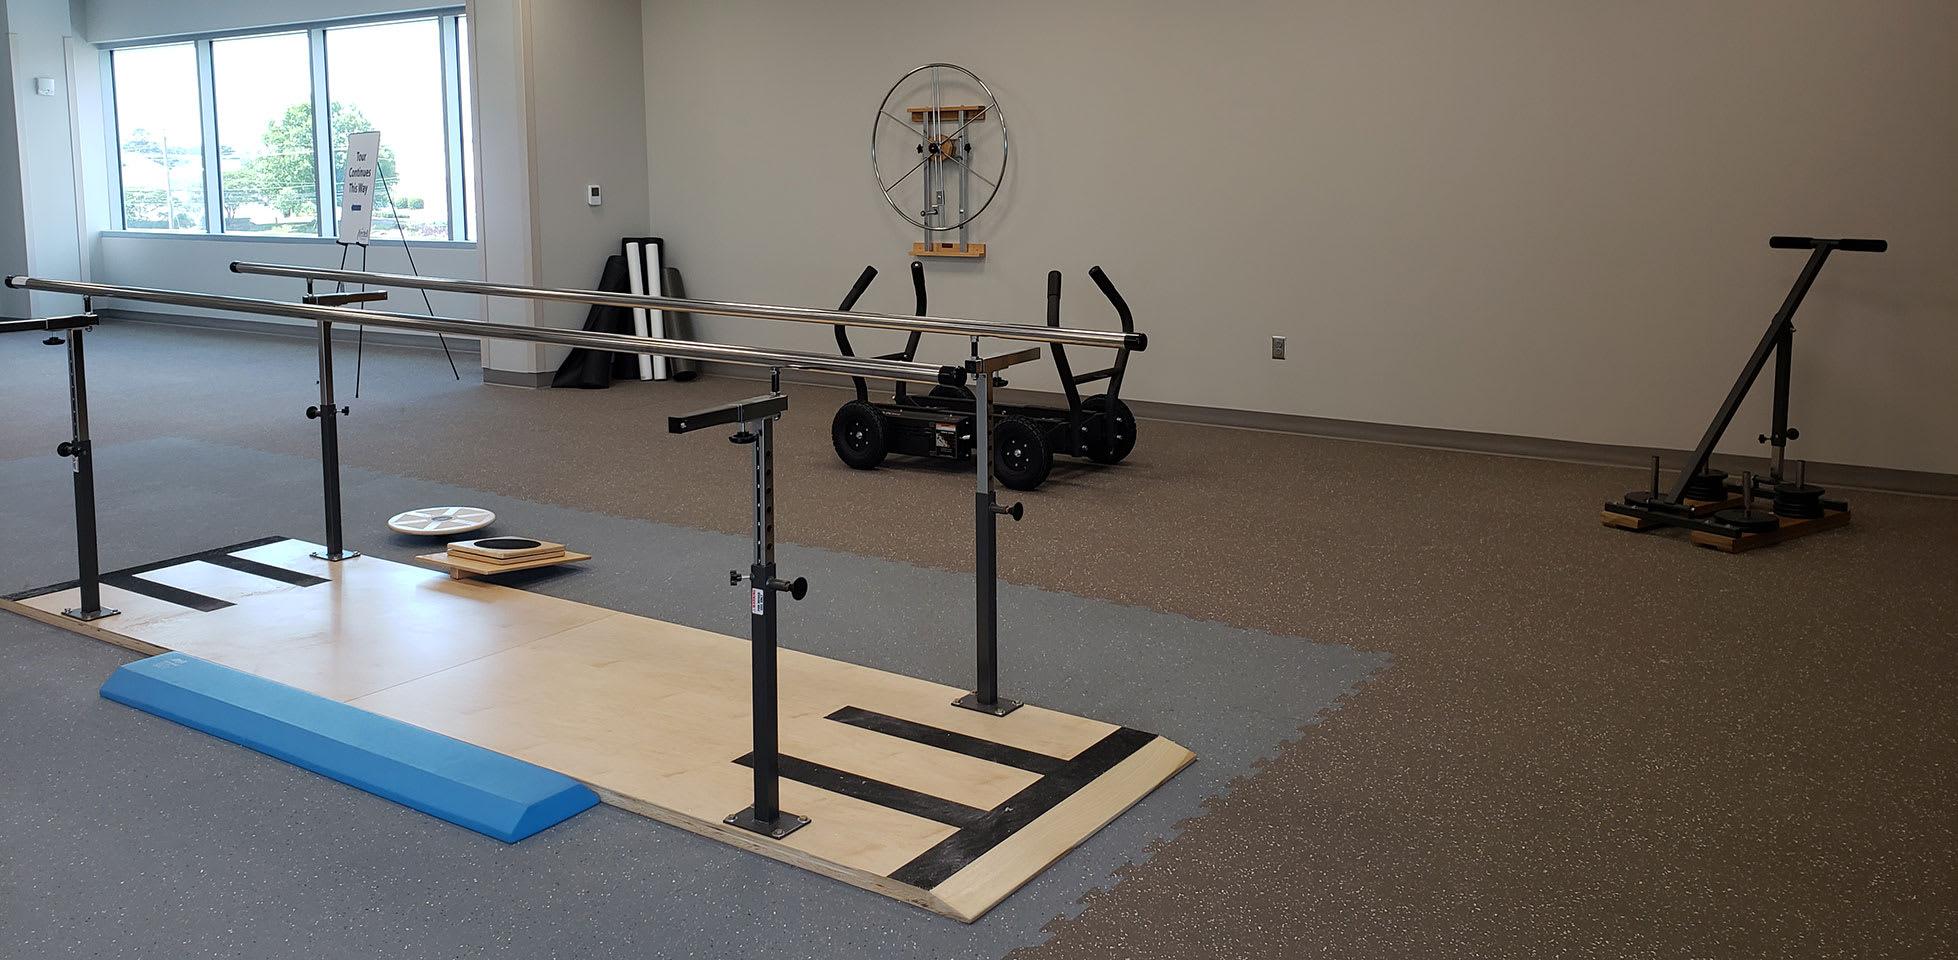 Balance and gait training